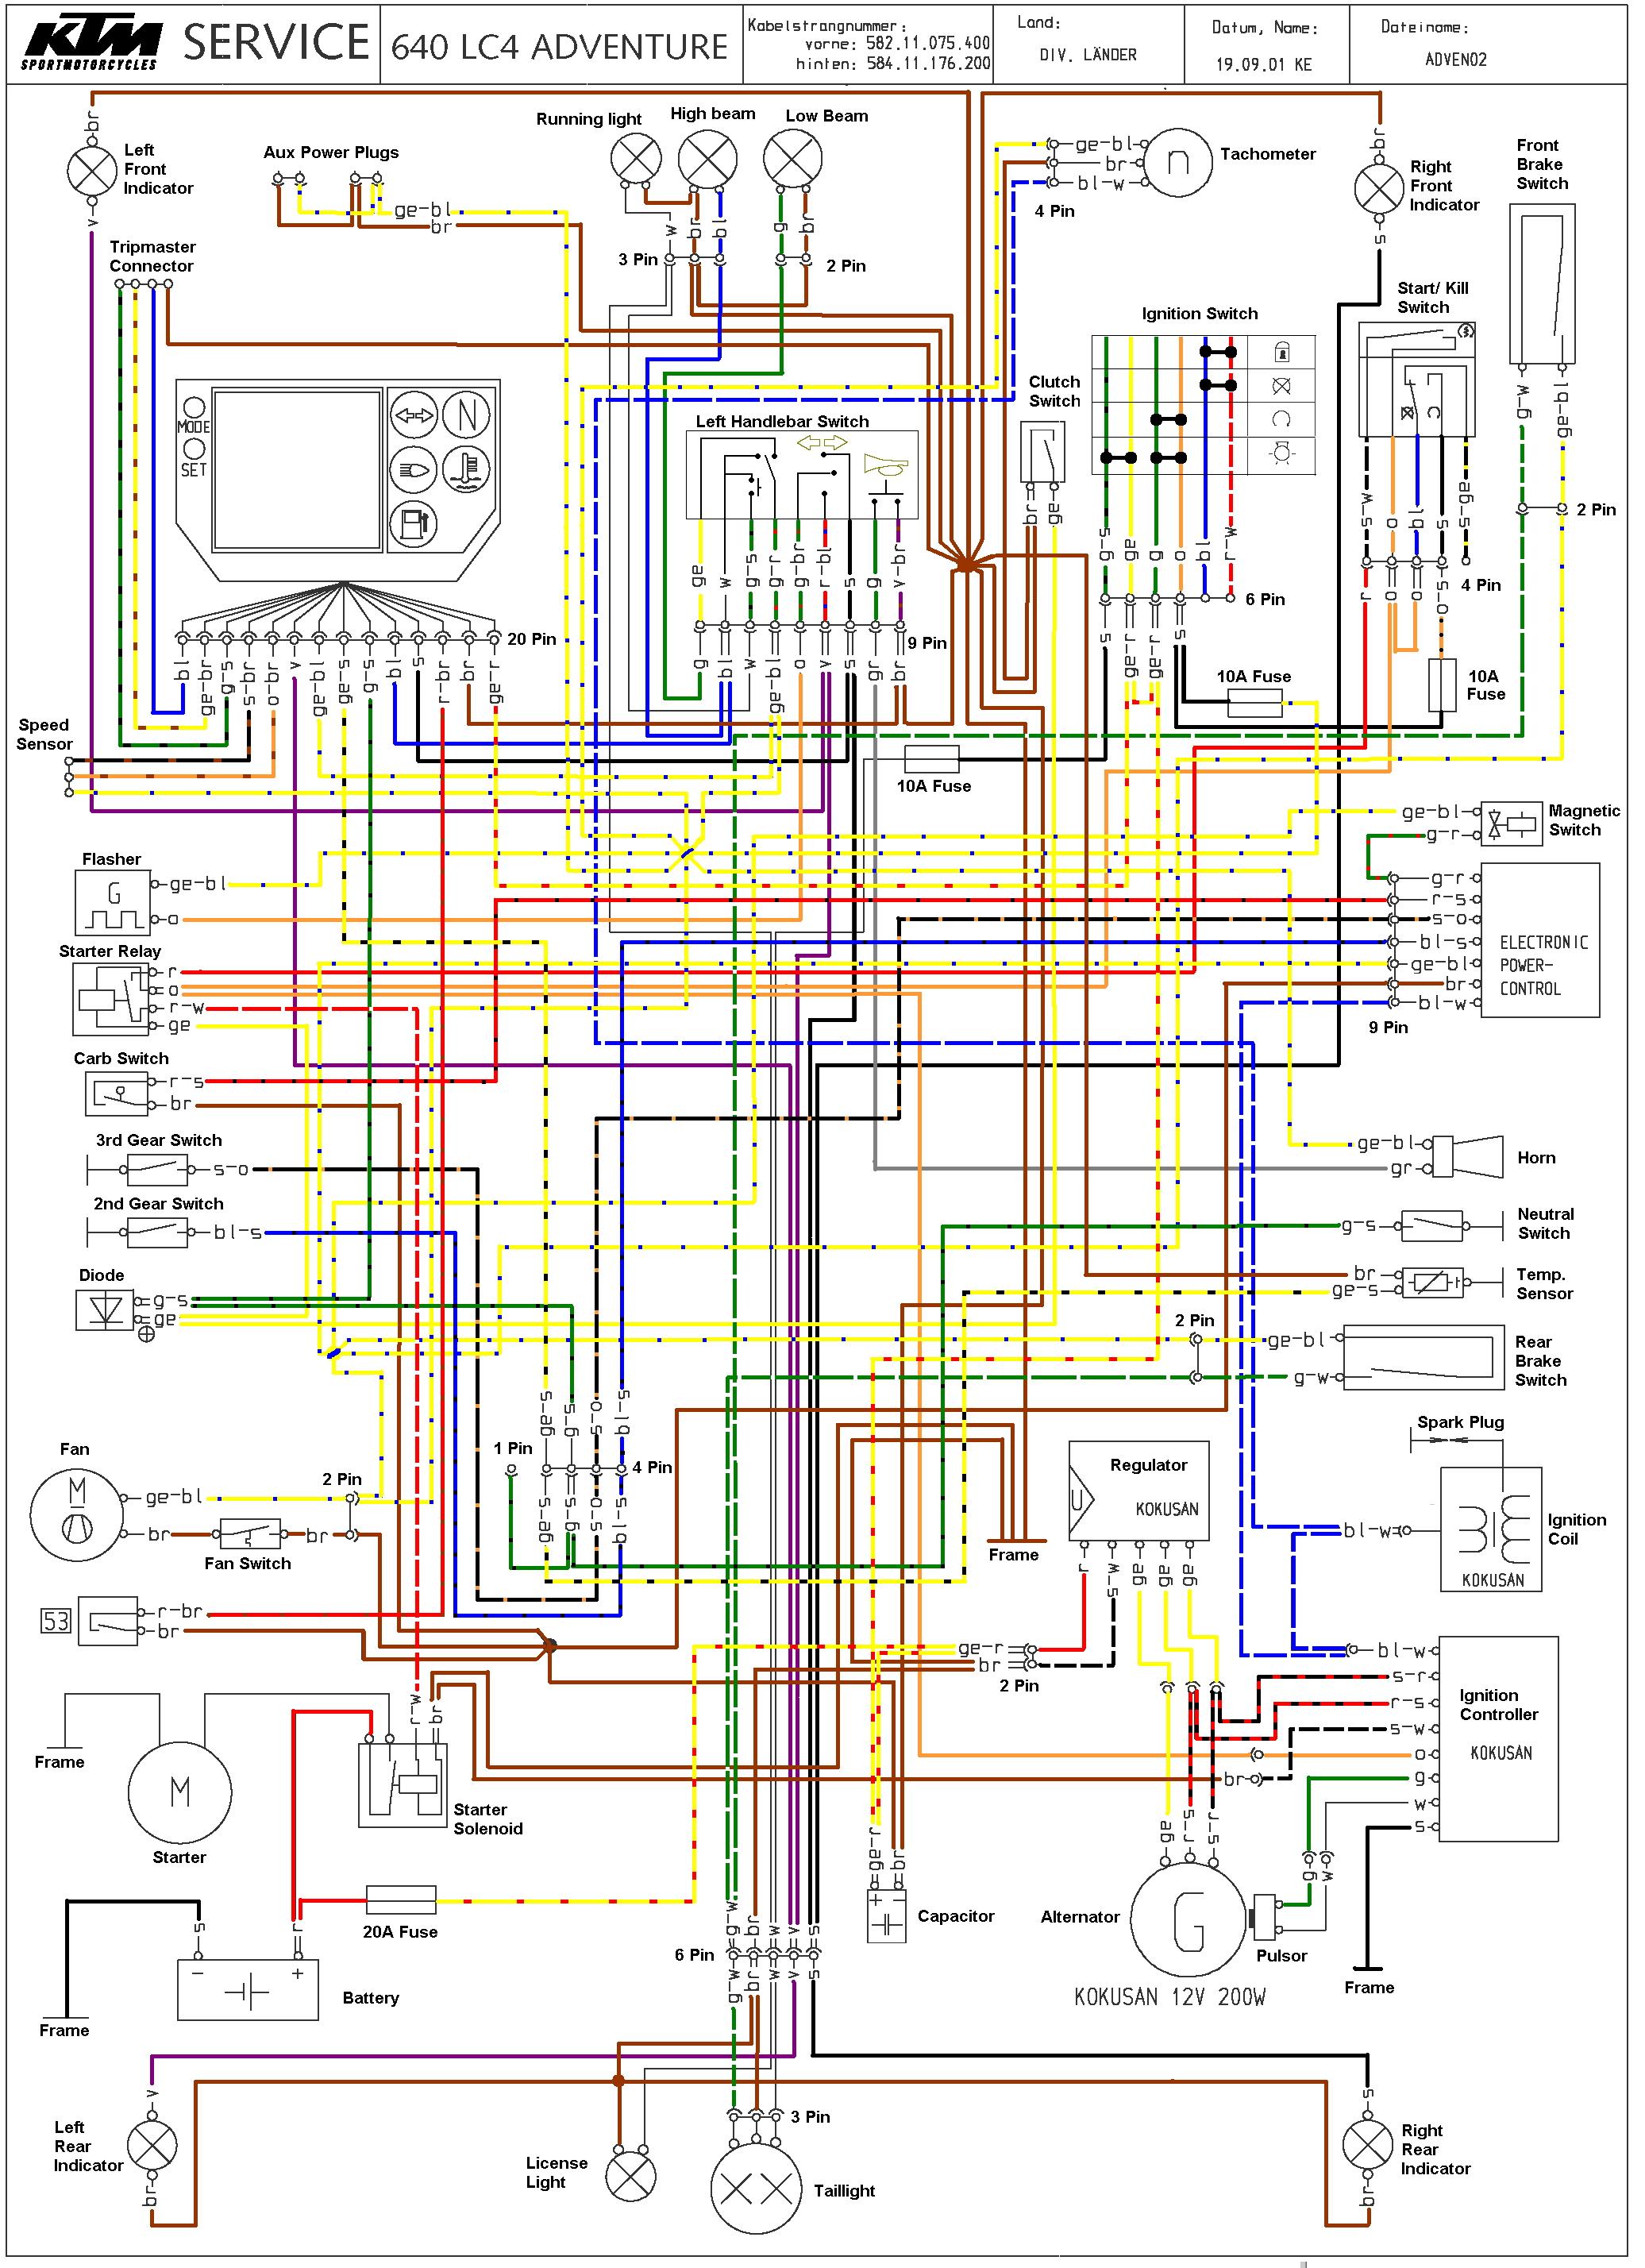 WRG-7679 Ktm 620 Wiring Diagram